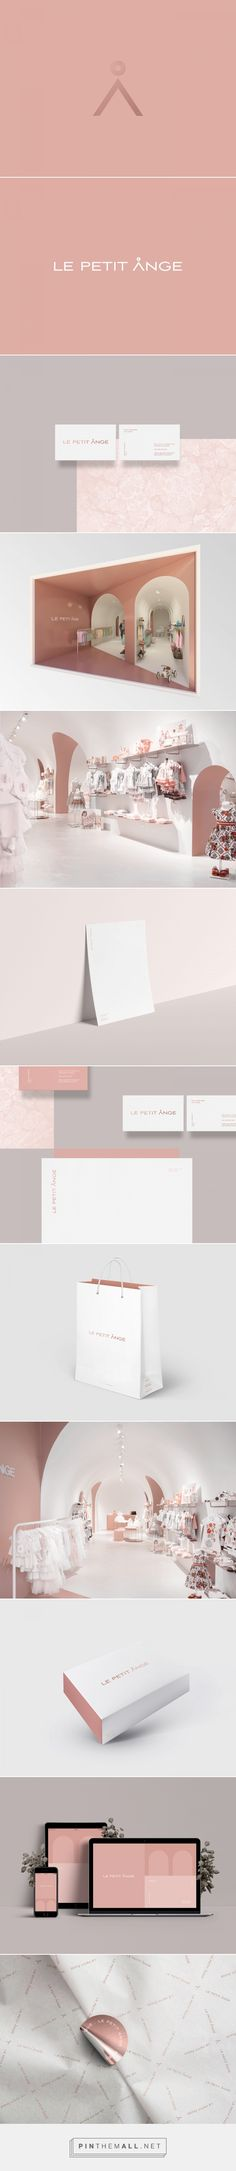 Le Petit Ånge Children's Clothing Boutique Branding by Bullseye | Fivestar Branding Agency – Design and Branding Agency & Curated Inspiration Gallery